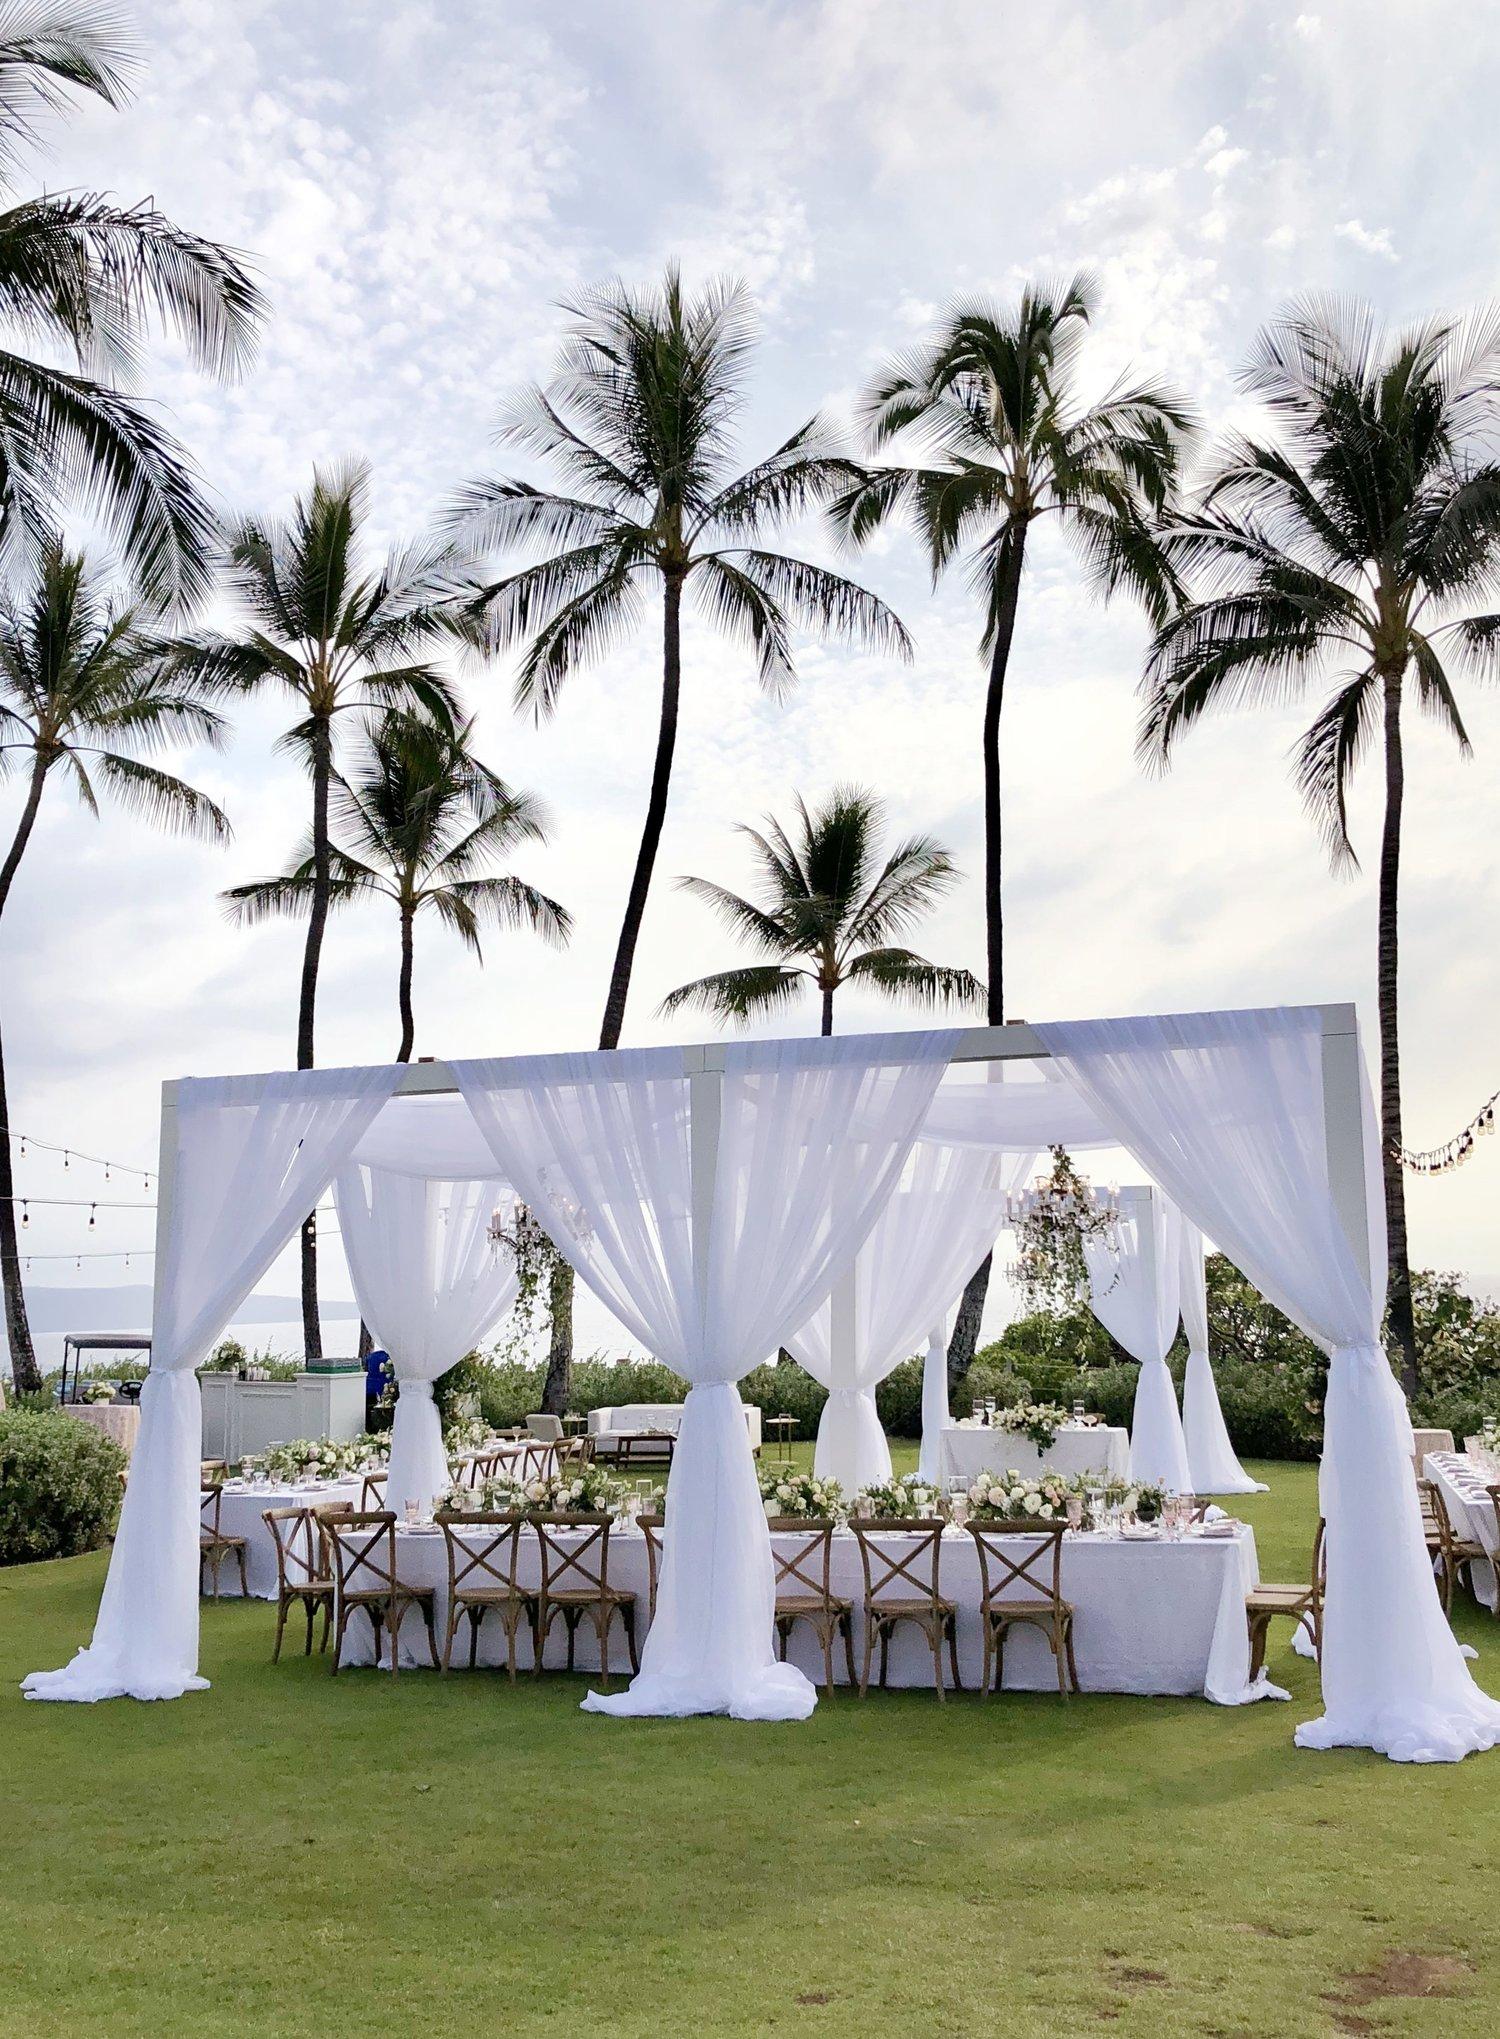 signature-maui-equipment-rentals-decor-for-weddings-in-maui-hawaii 3.jpg